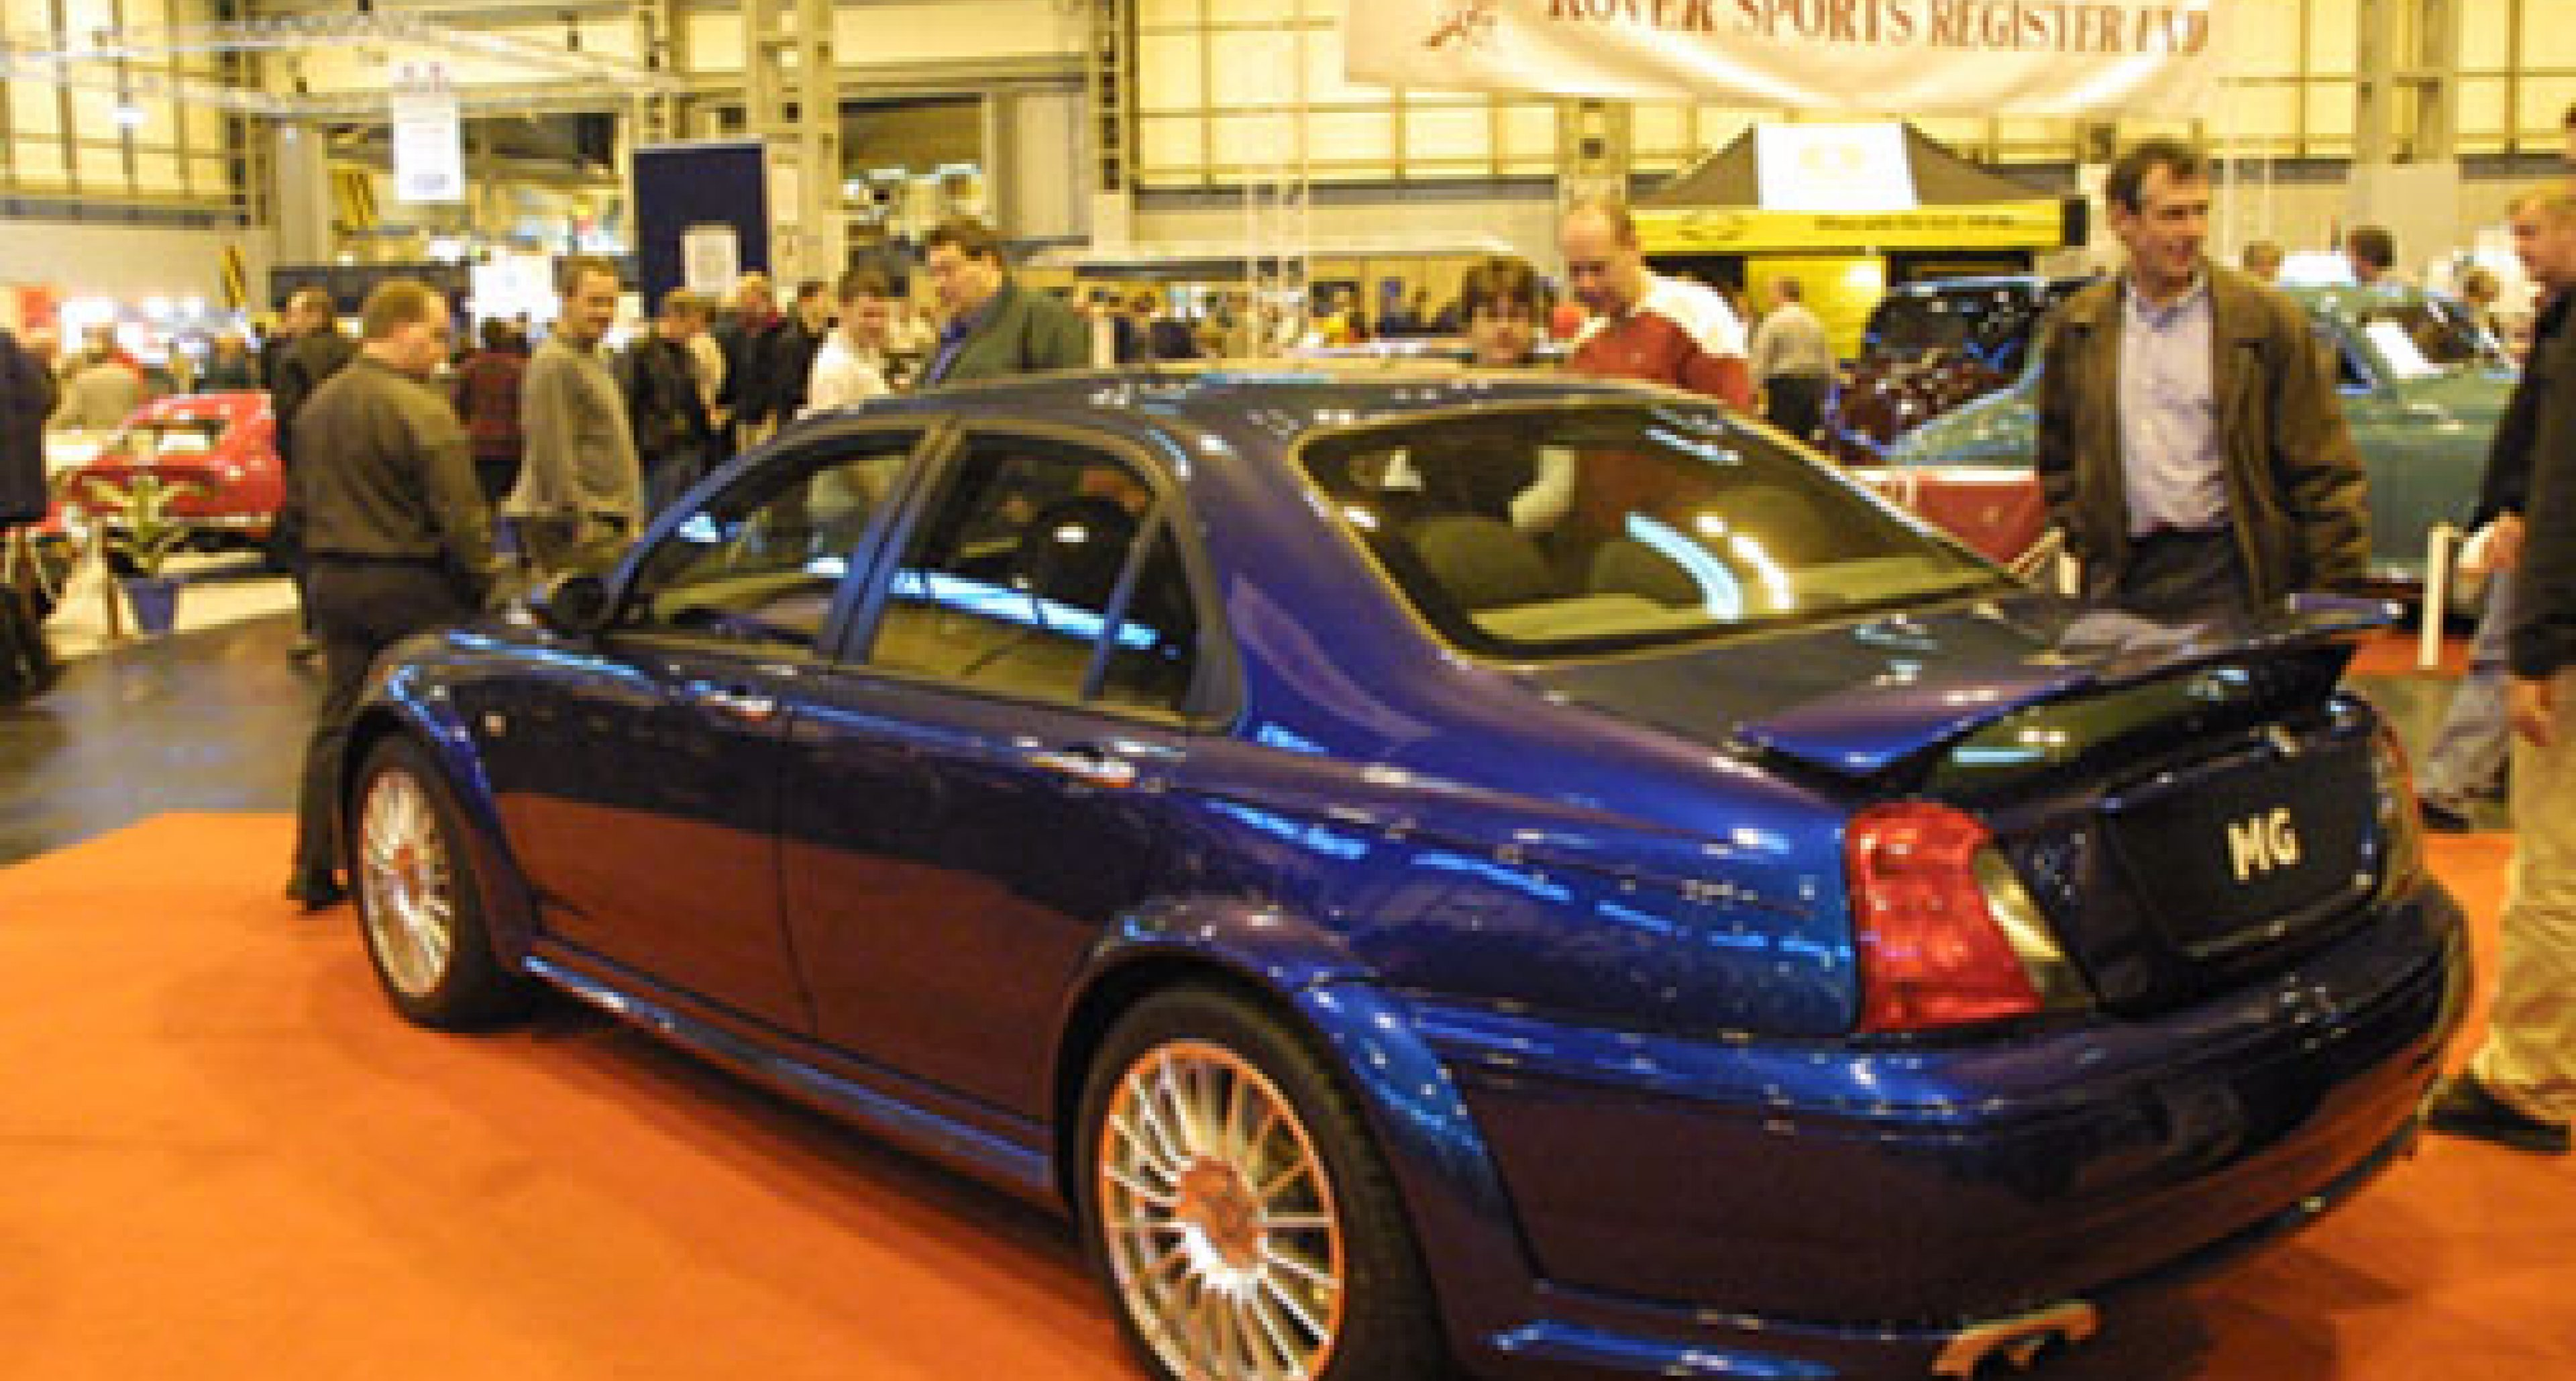 International Classic Car Show Birmingham UK Classic Driver - Mg car show